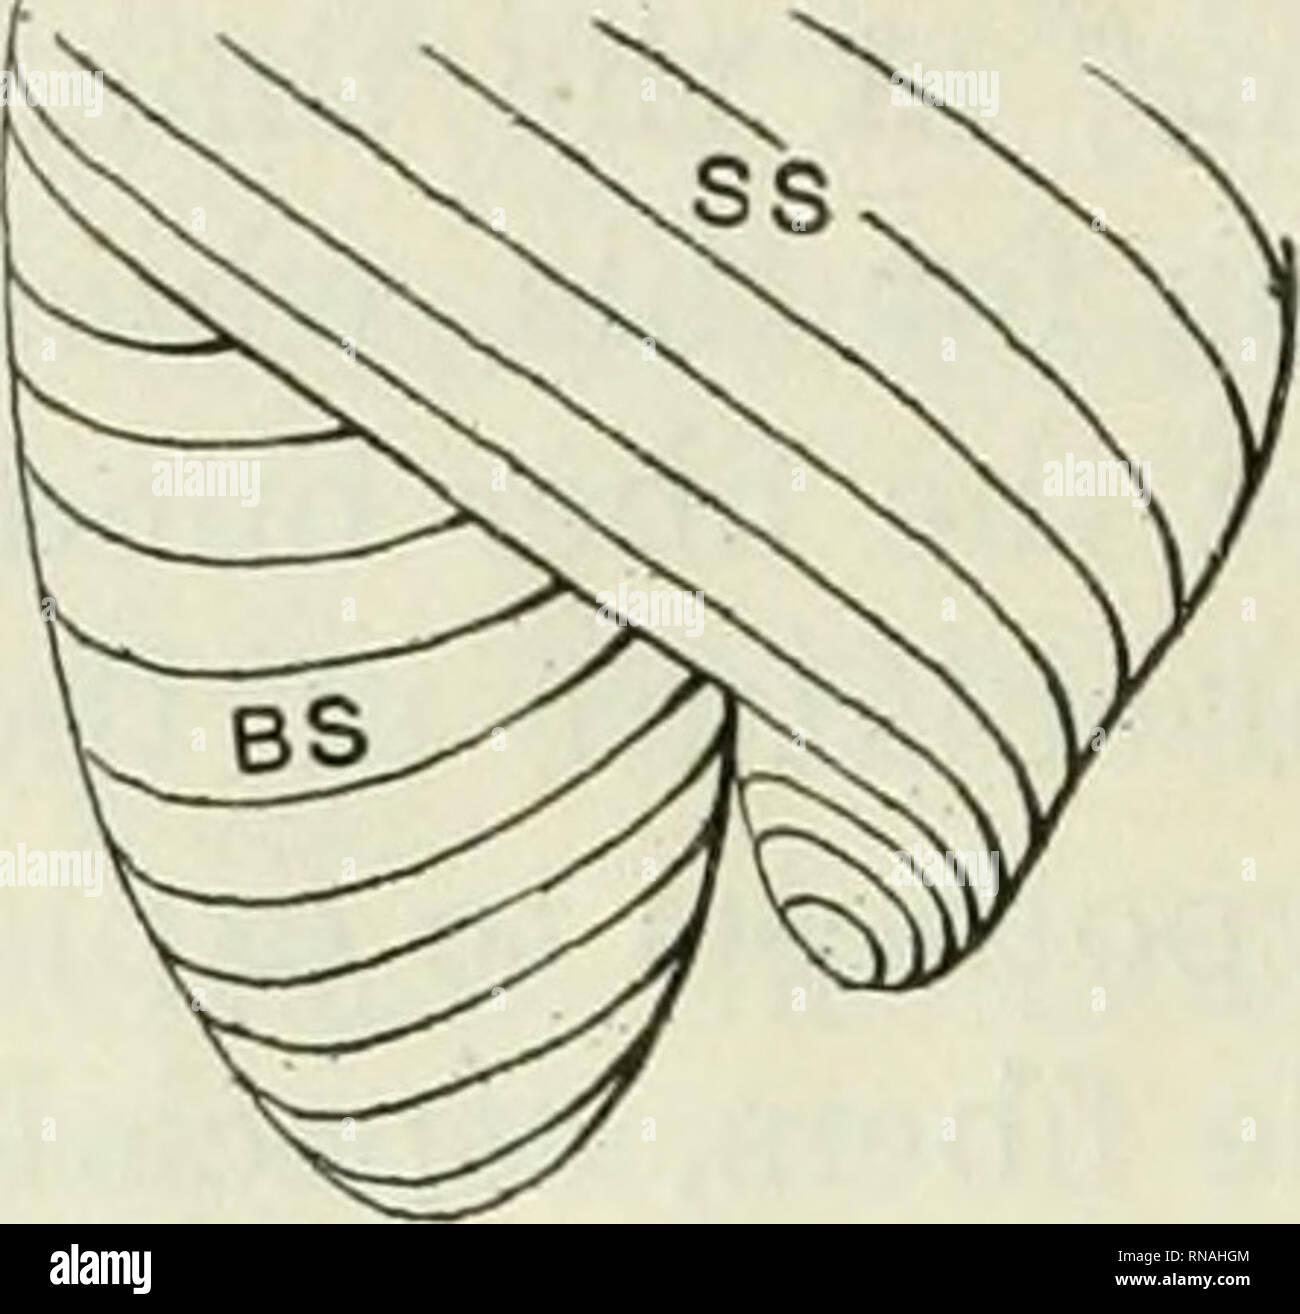 The anatomical record  Anatomy